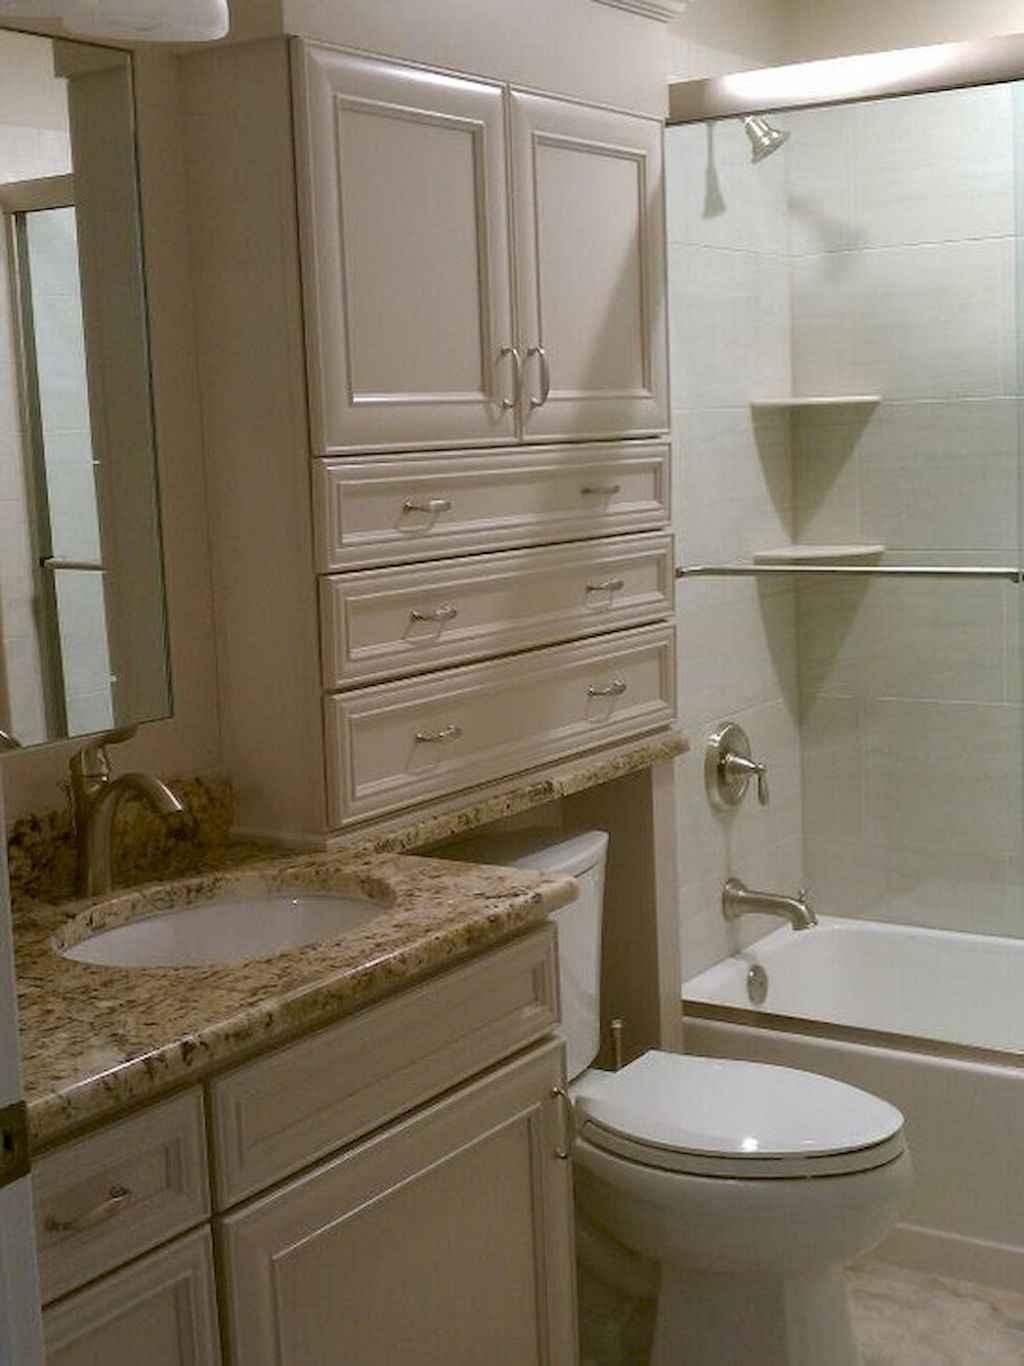 Inspiring apartment bathroom remodel ideas on a budget (31)